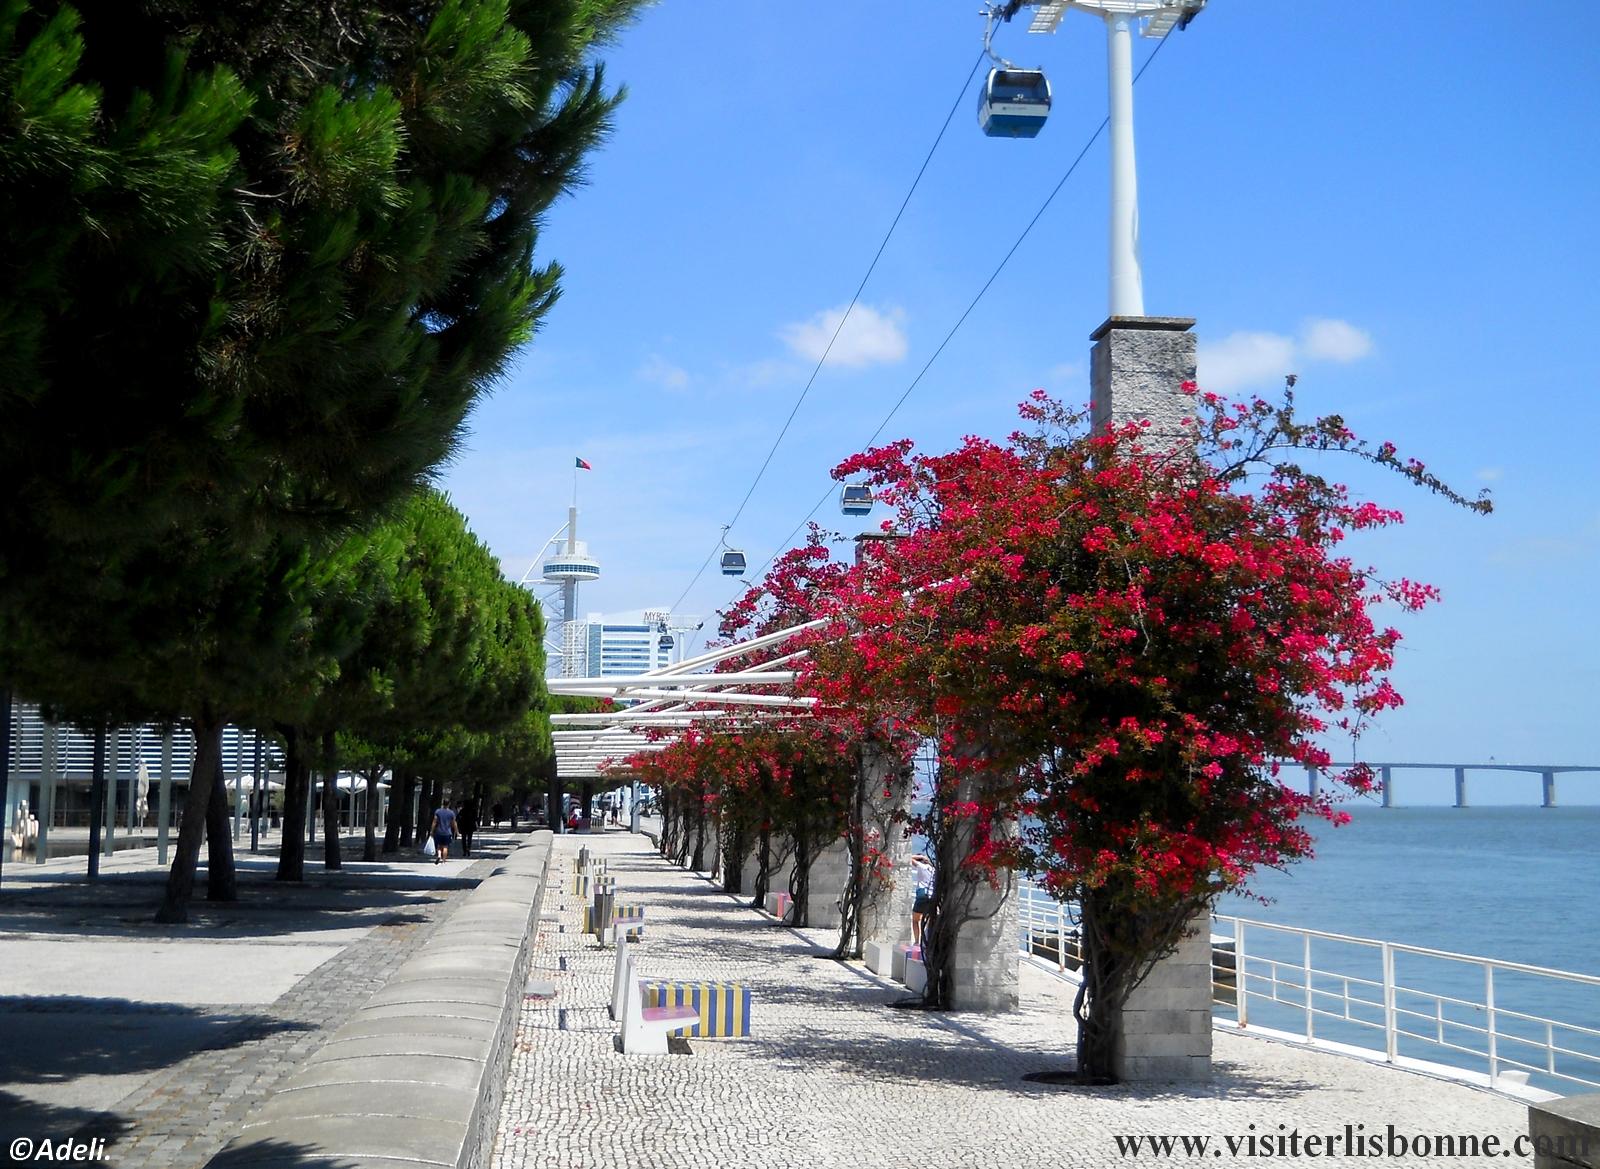 Tour Vasco de Gama - Torre Vasco da Gama - Parc des Nations - Lisbonne